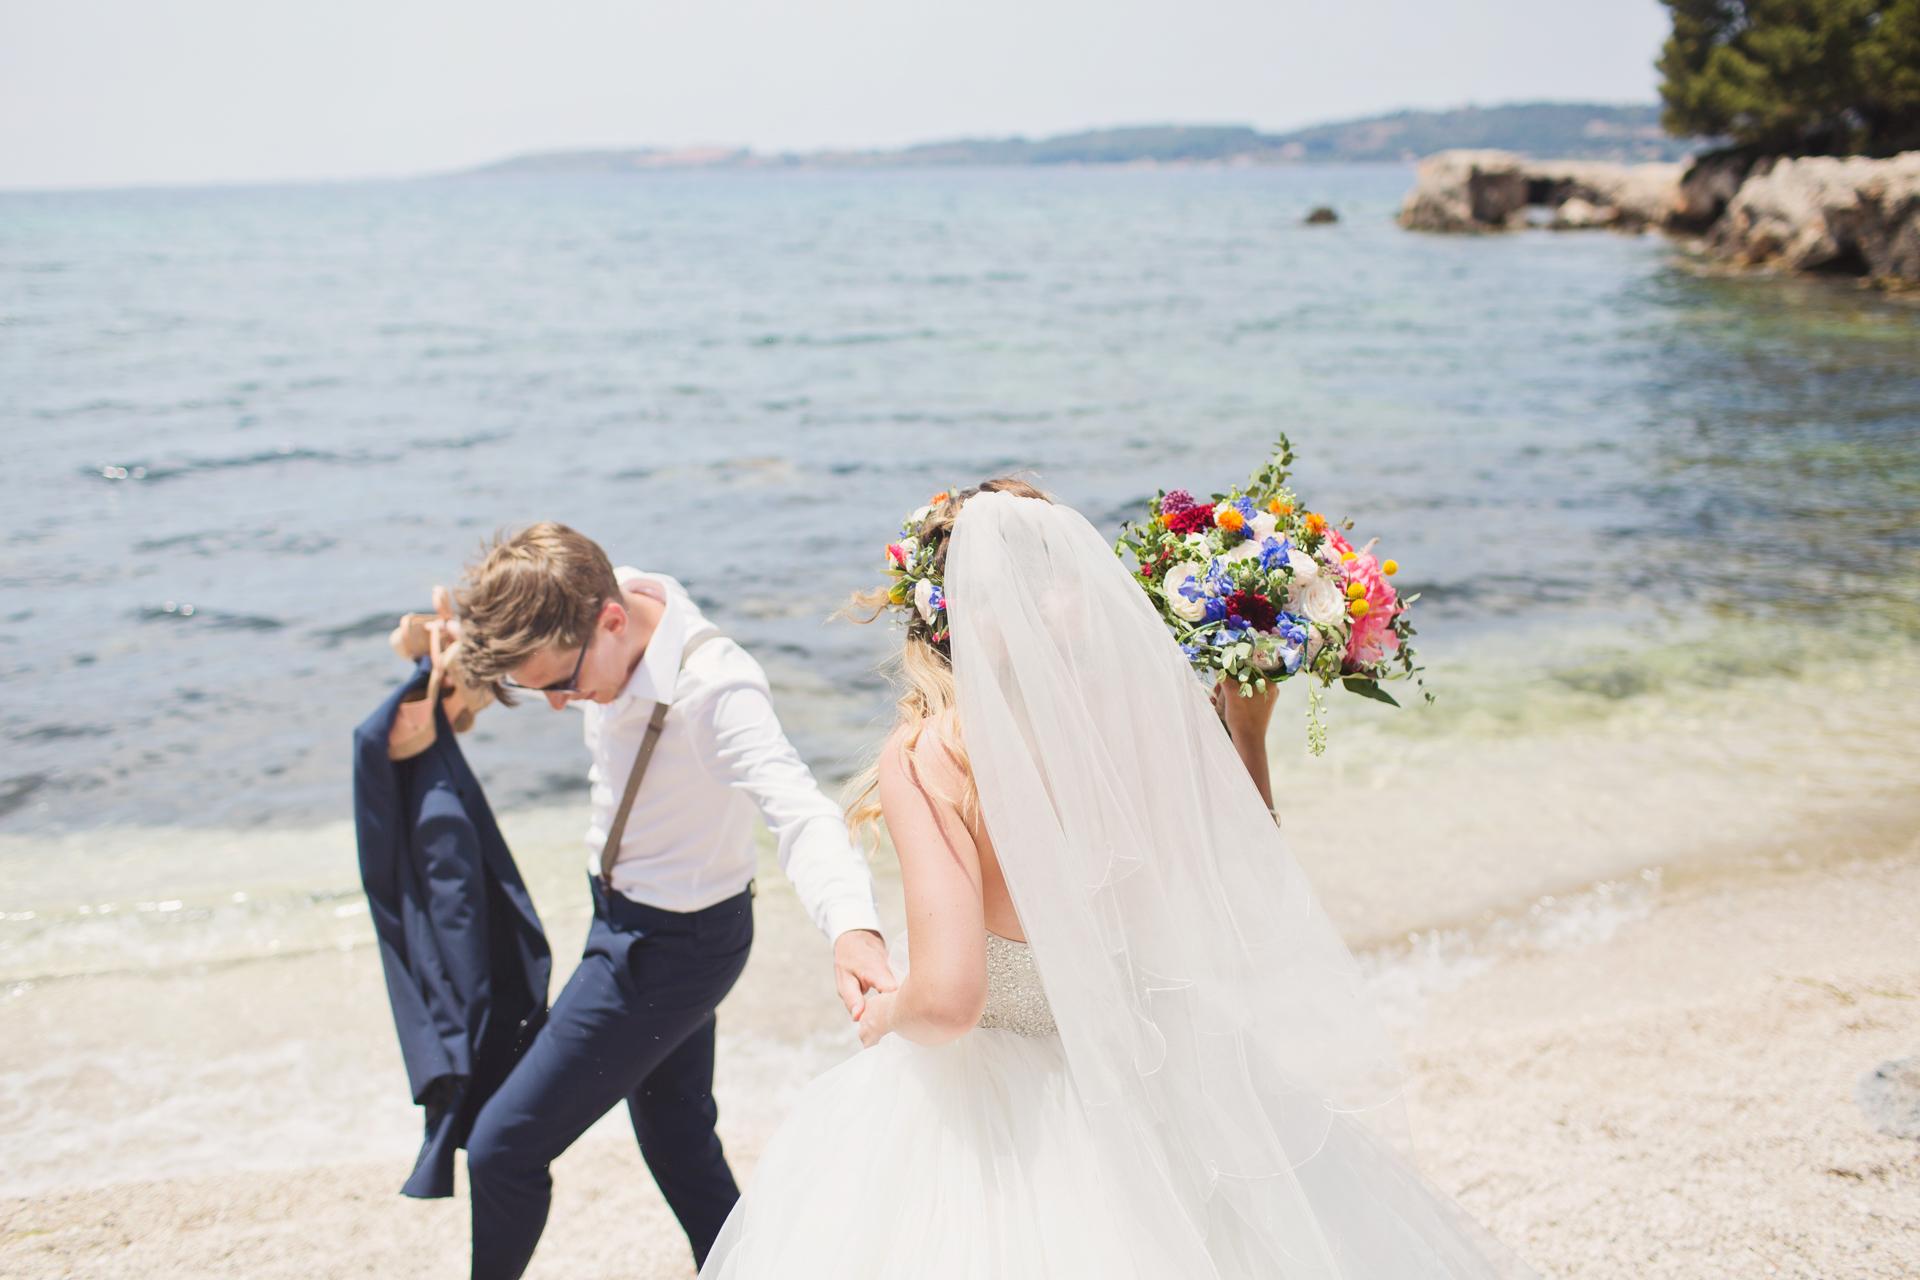 Image of a seaside wedding in Kefalonia